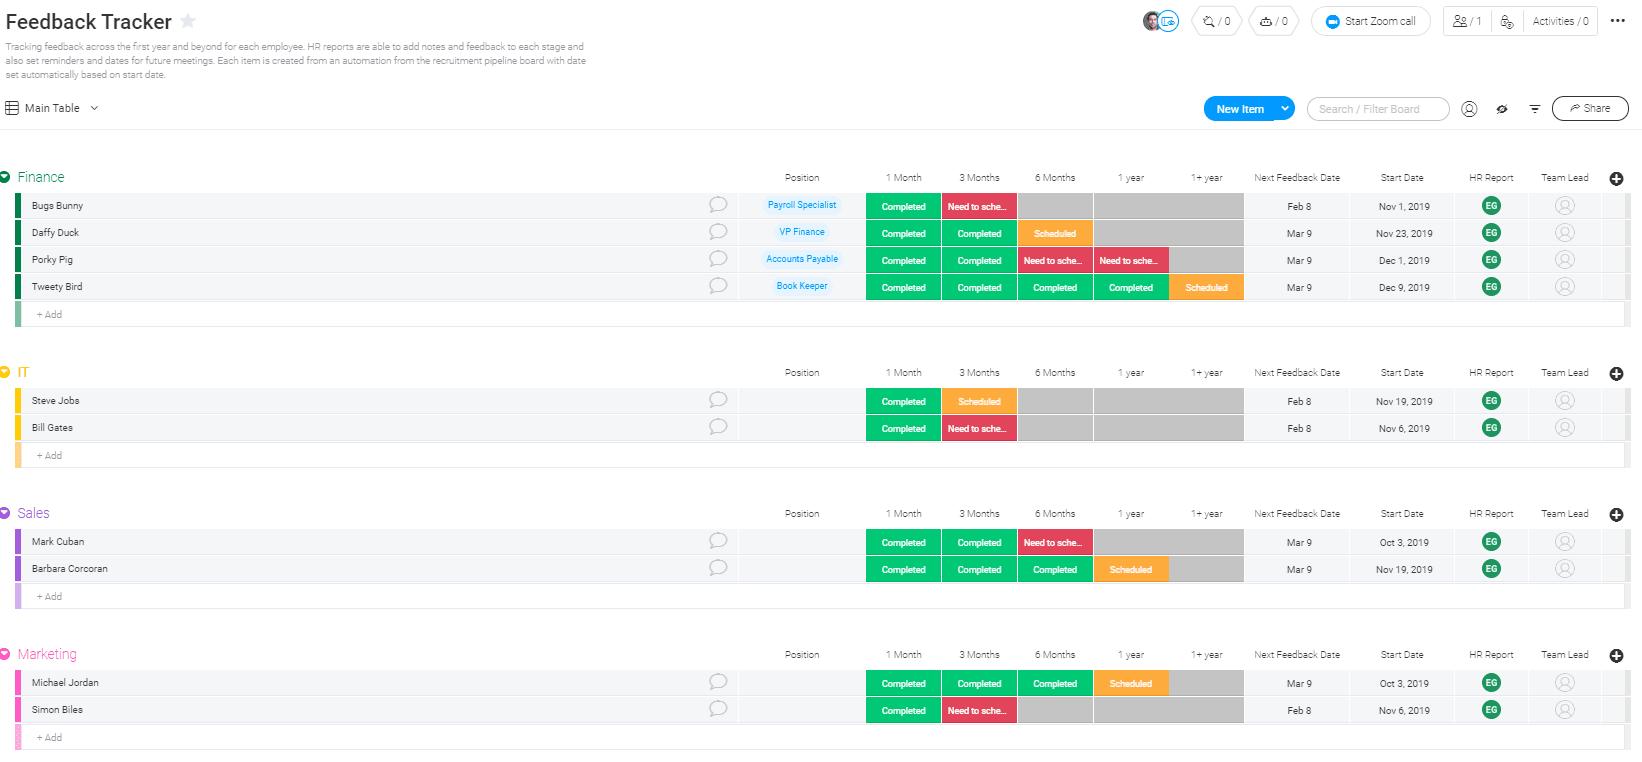 monday.com feedback tracker template